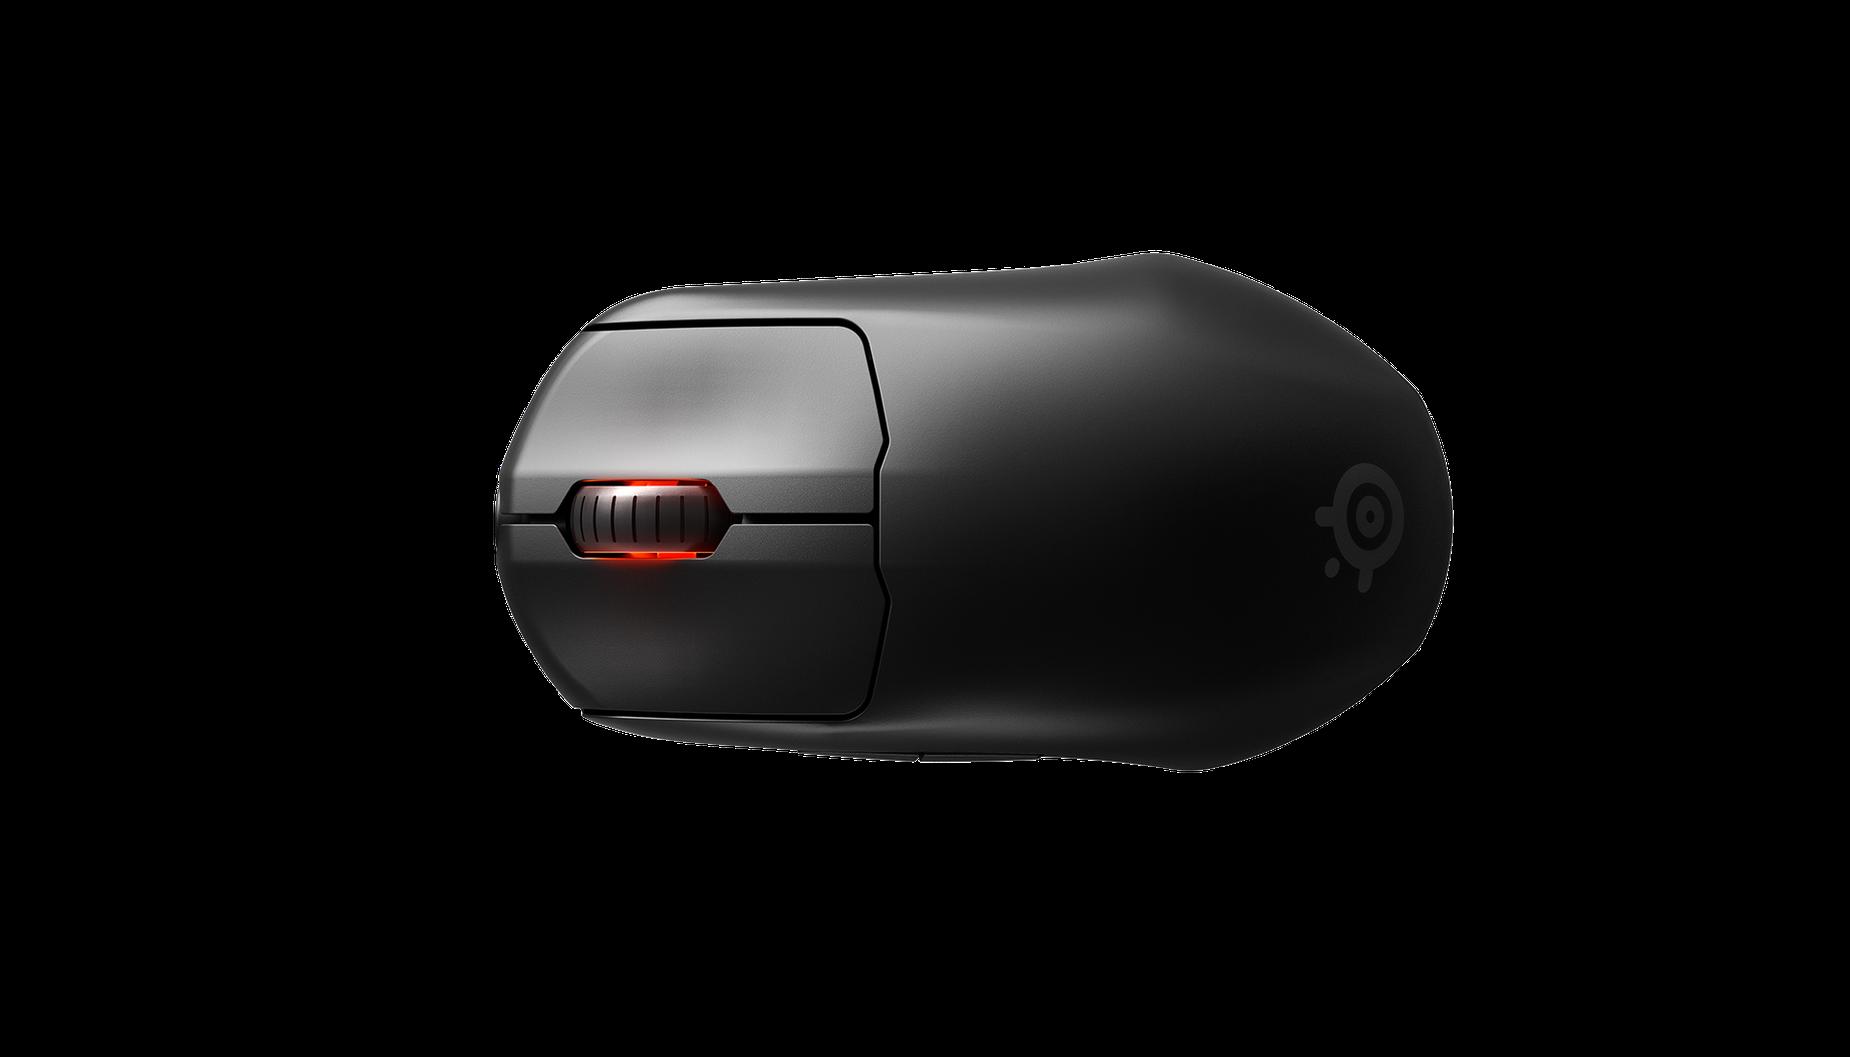 Prime 無線滑鼠的俯視圖。